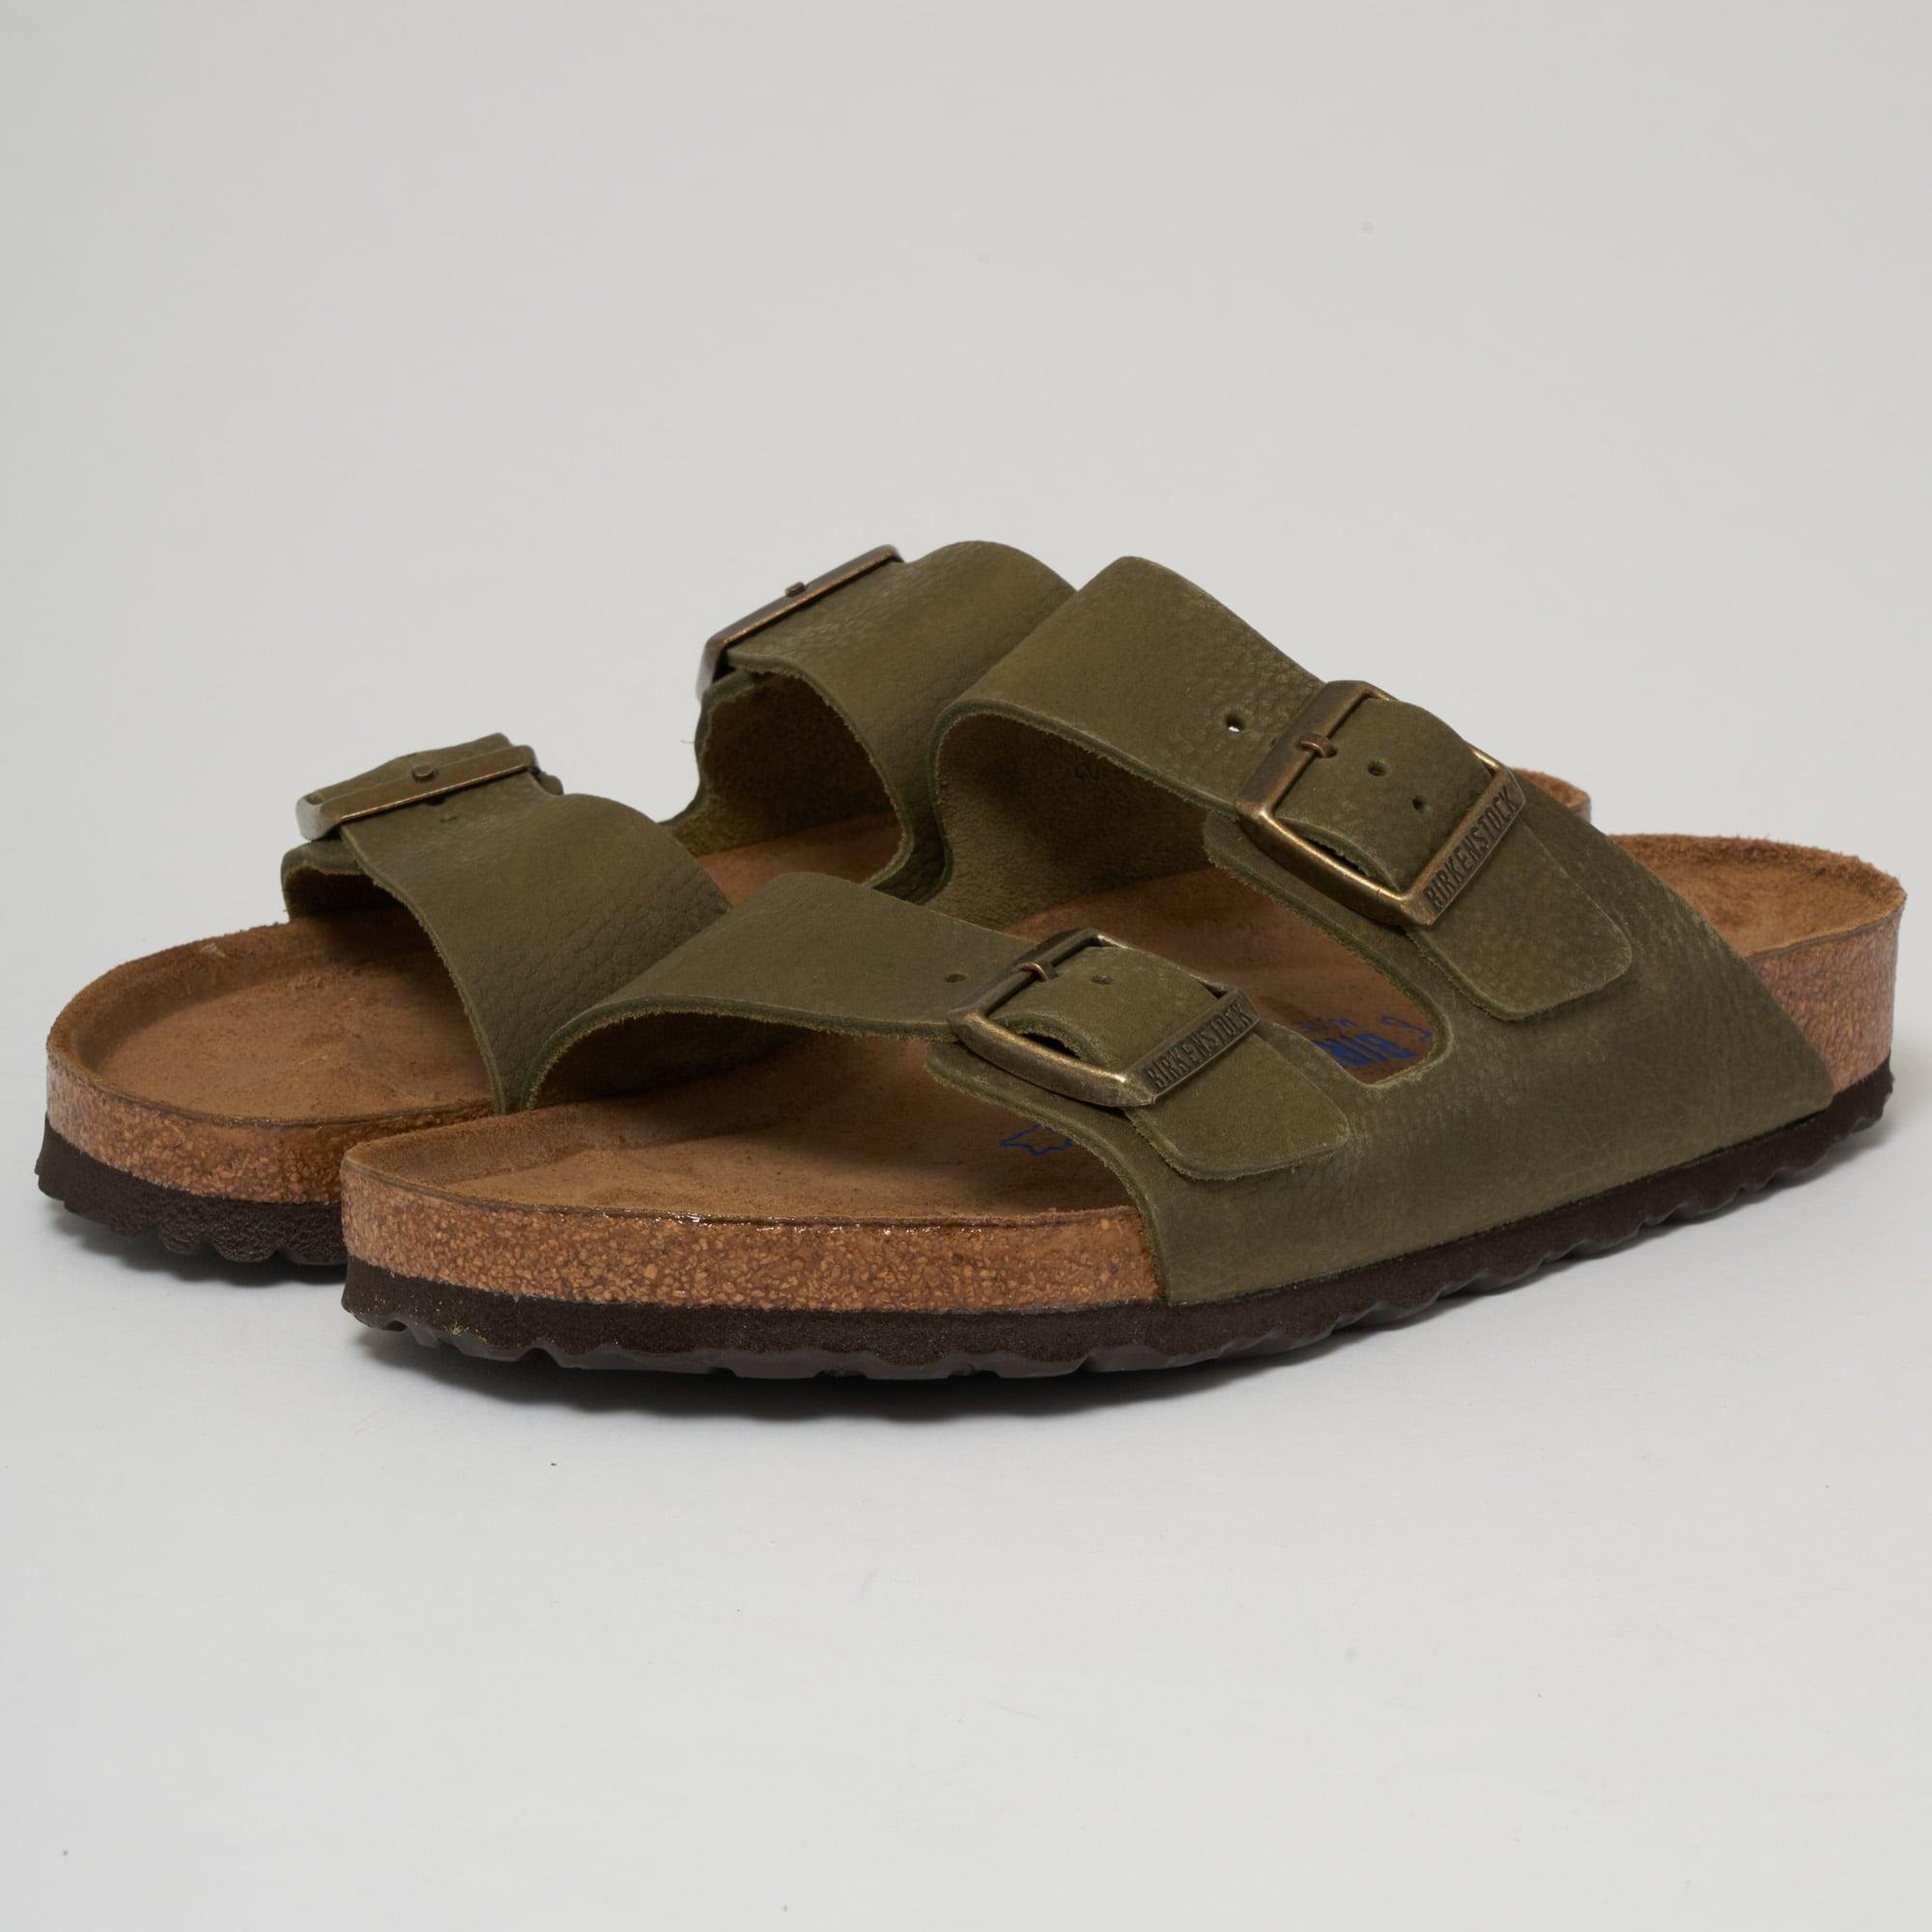 a6c2153f8282 Birkenstock Arizona Sandals Steer Khaki | US Online Shop